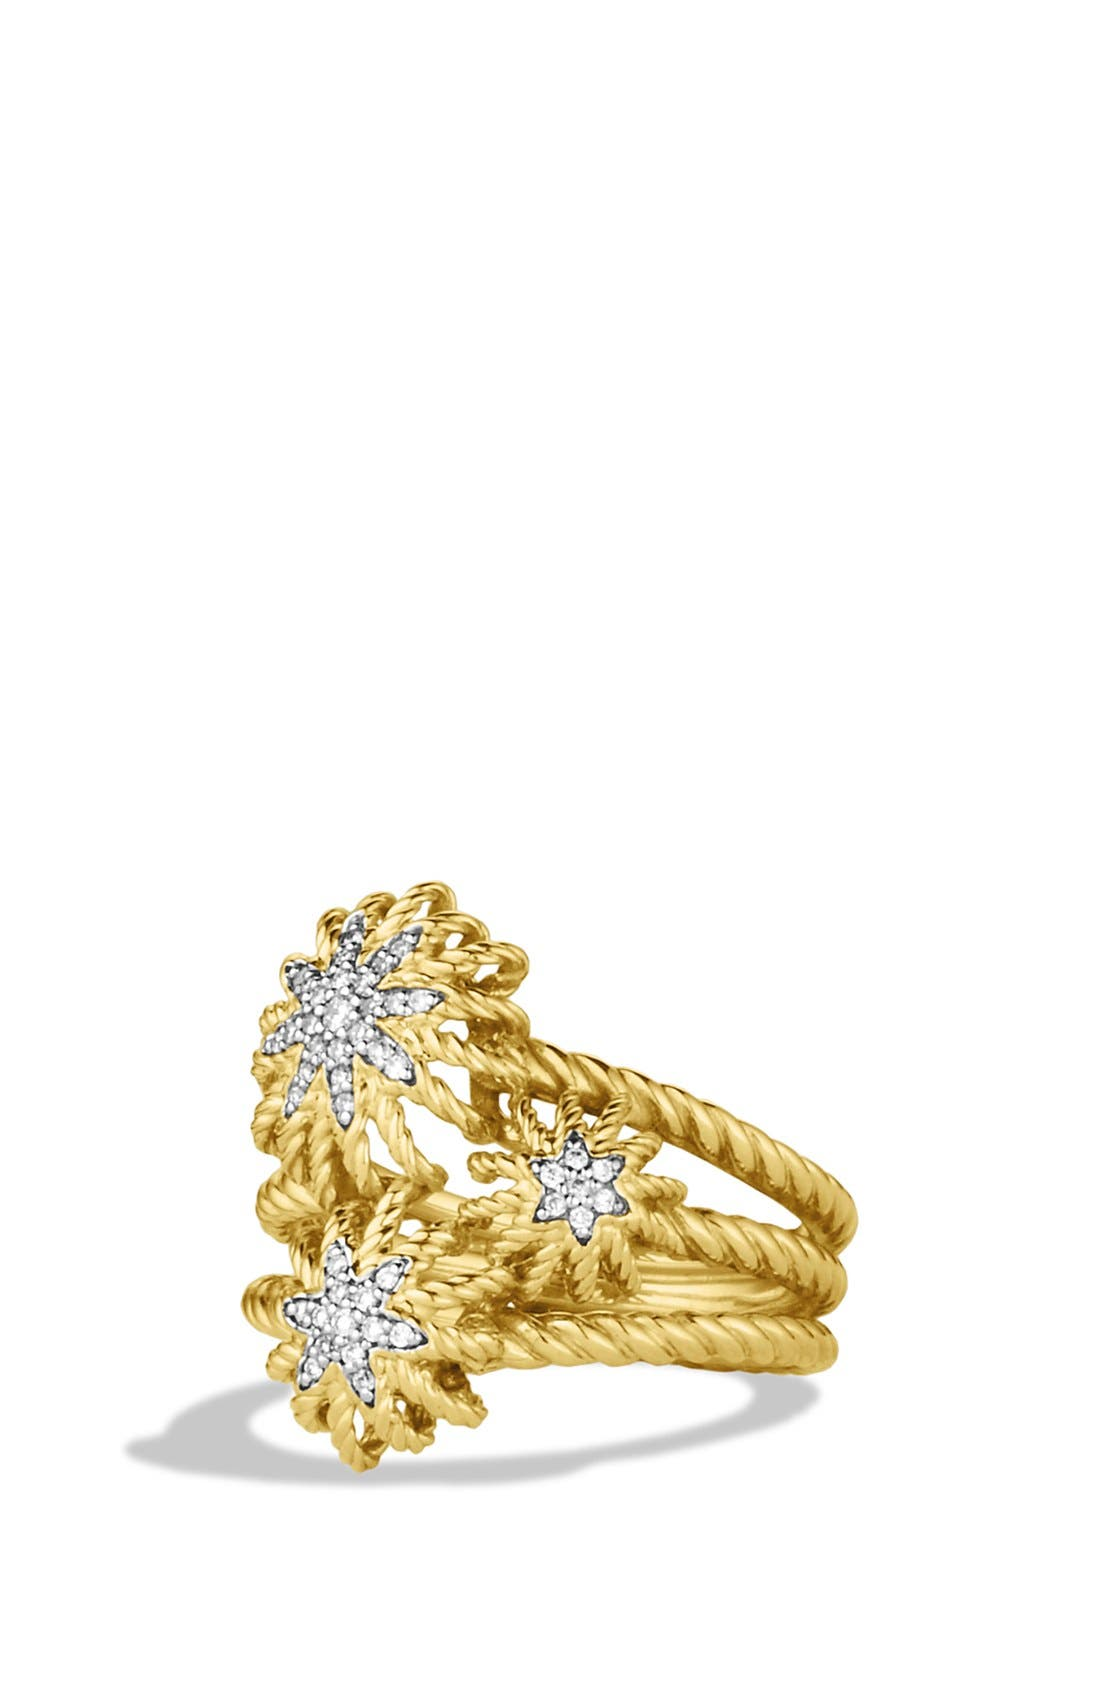 Main Image - David Yurman 'Starburst' Cluster Ring with Diamonds in Gold